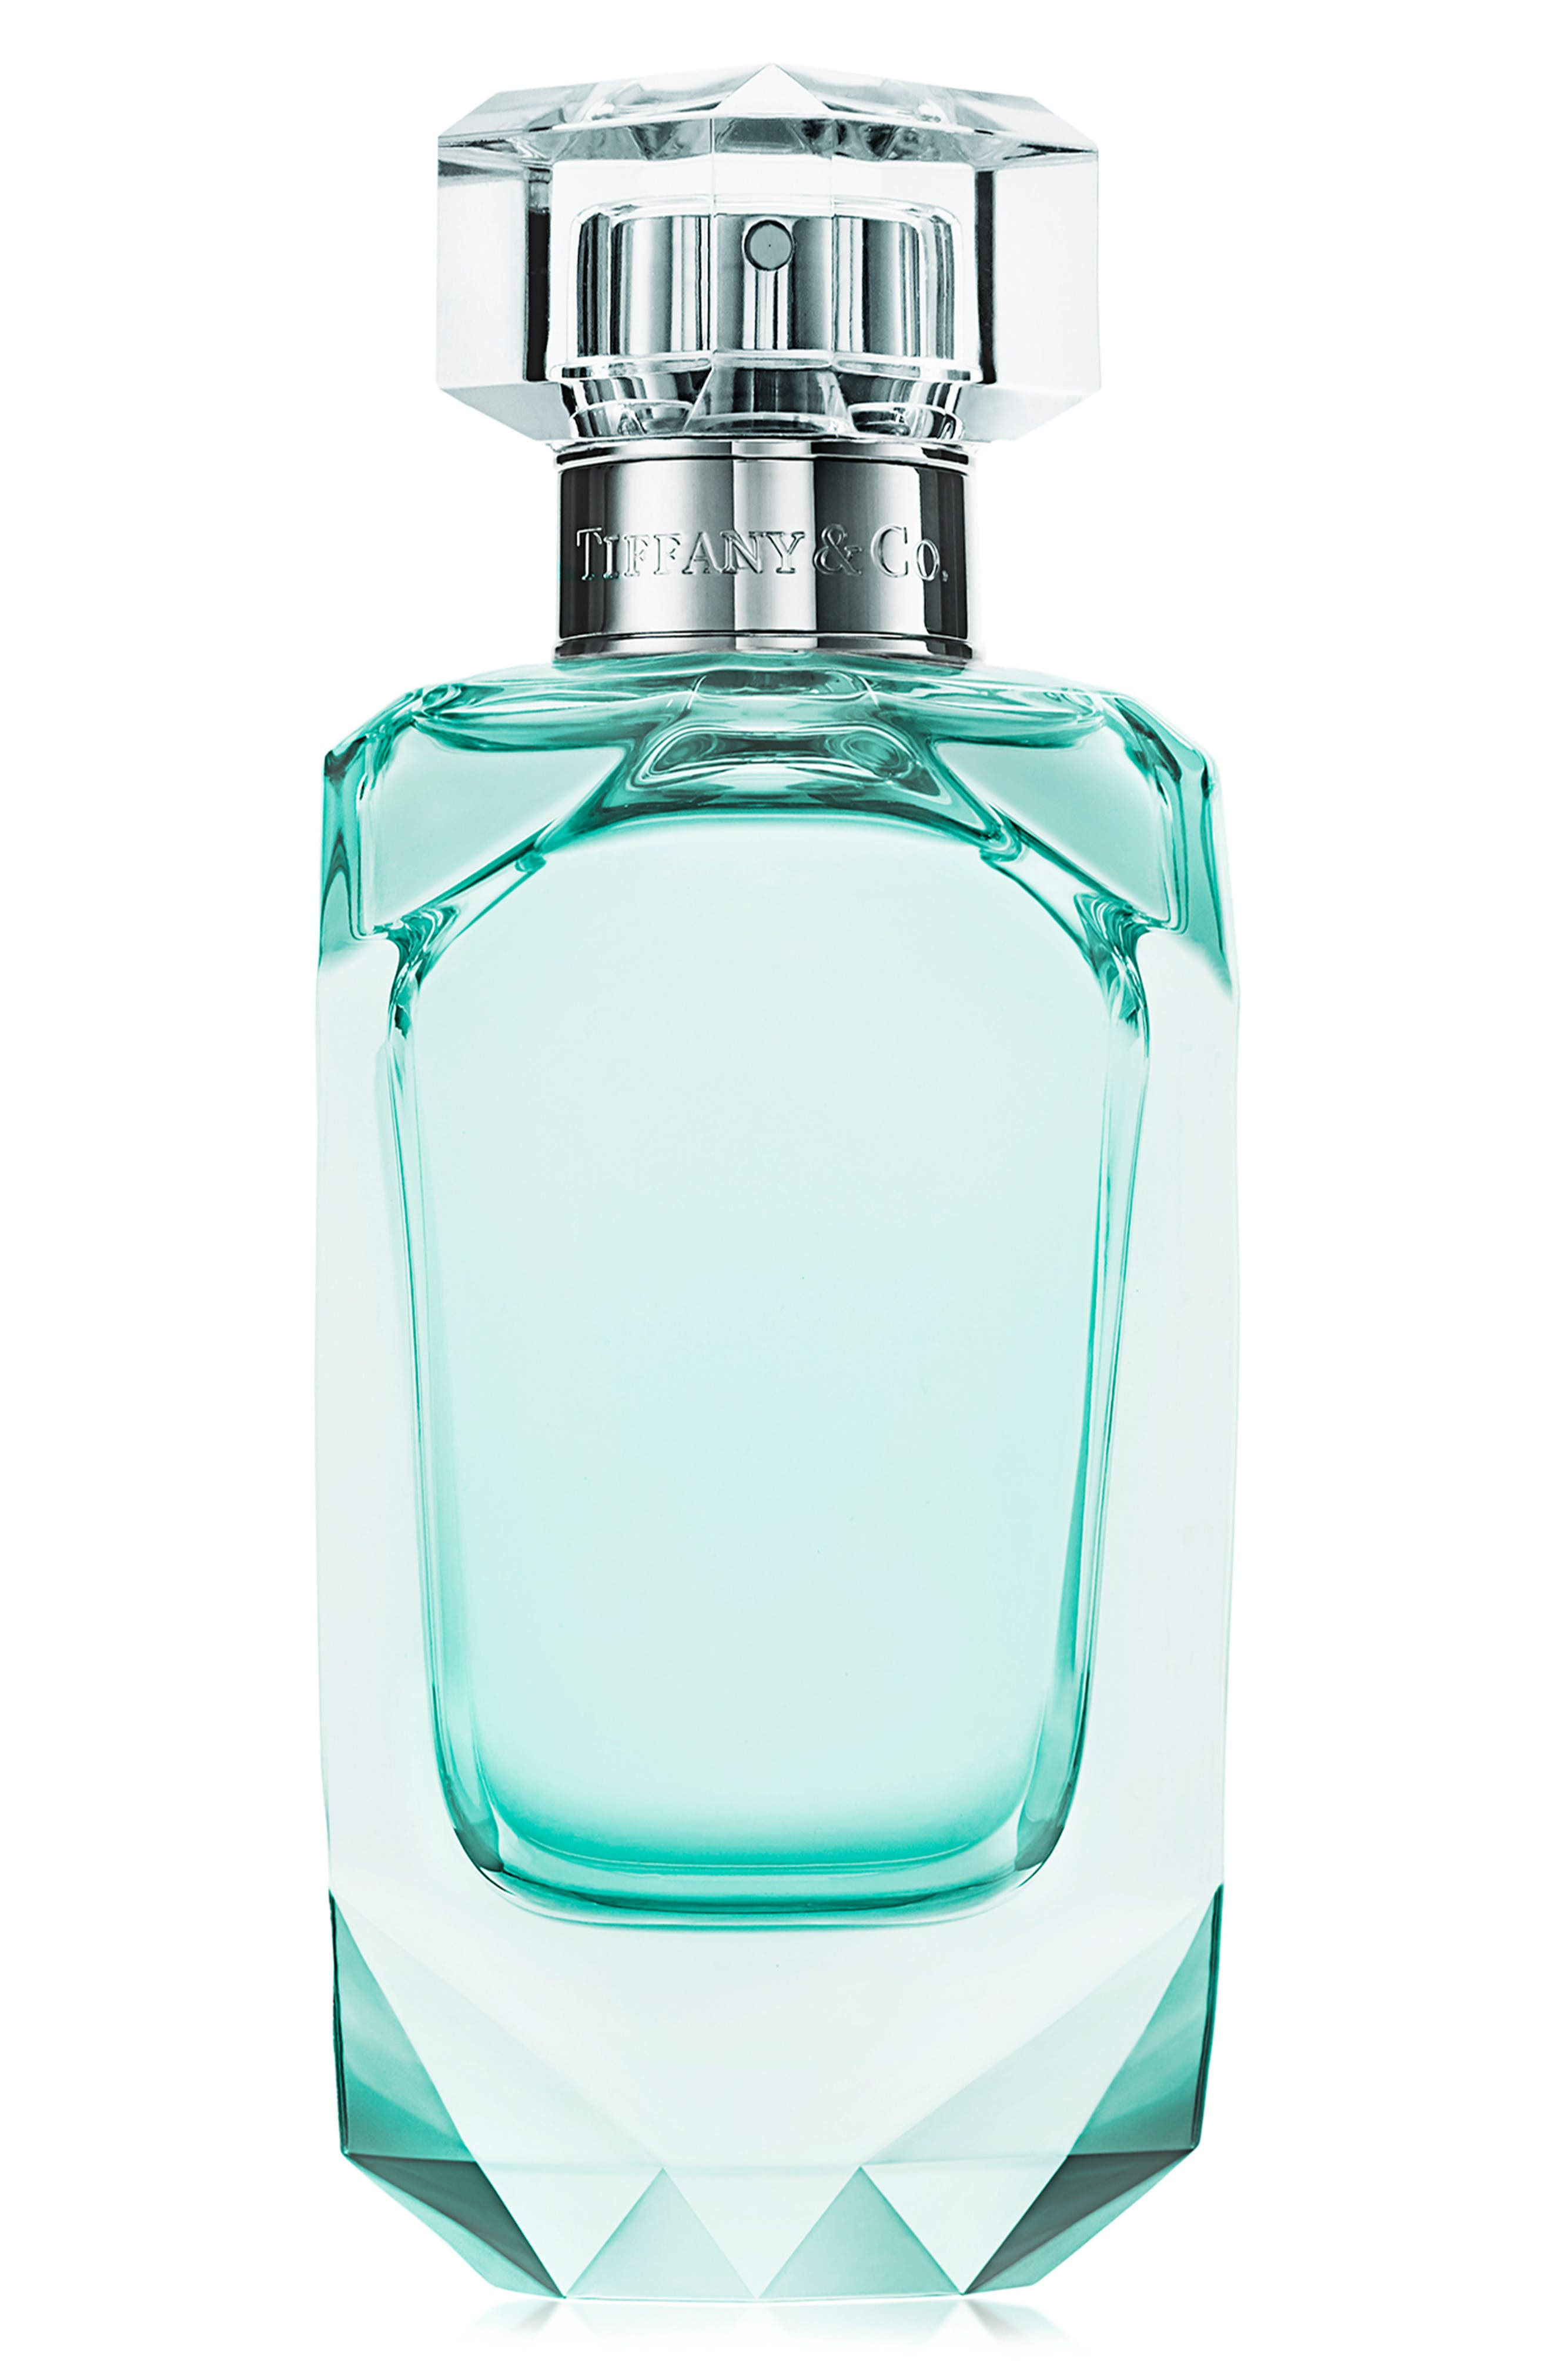 ec9110a36 Women's Tiffany & Co. Perfume & Fragrances | Nordstrom